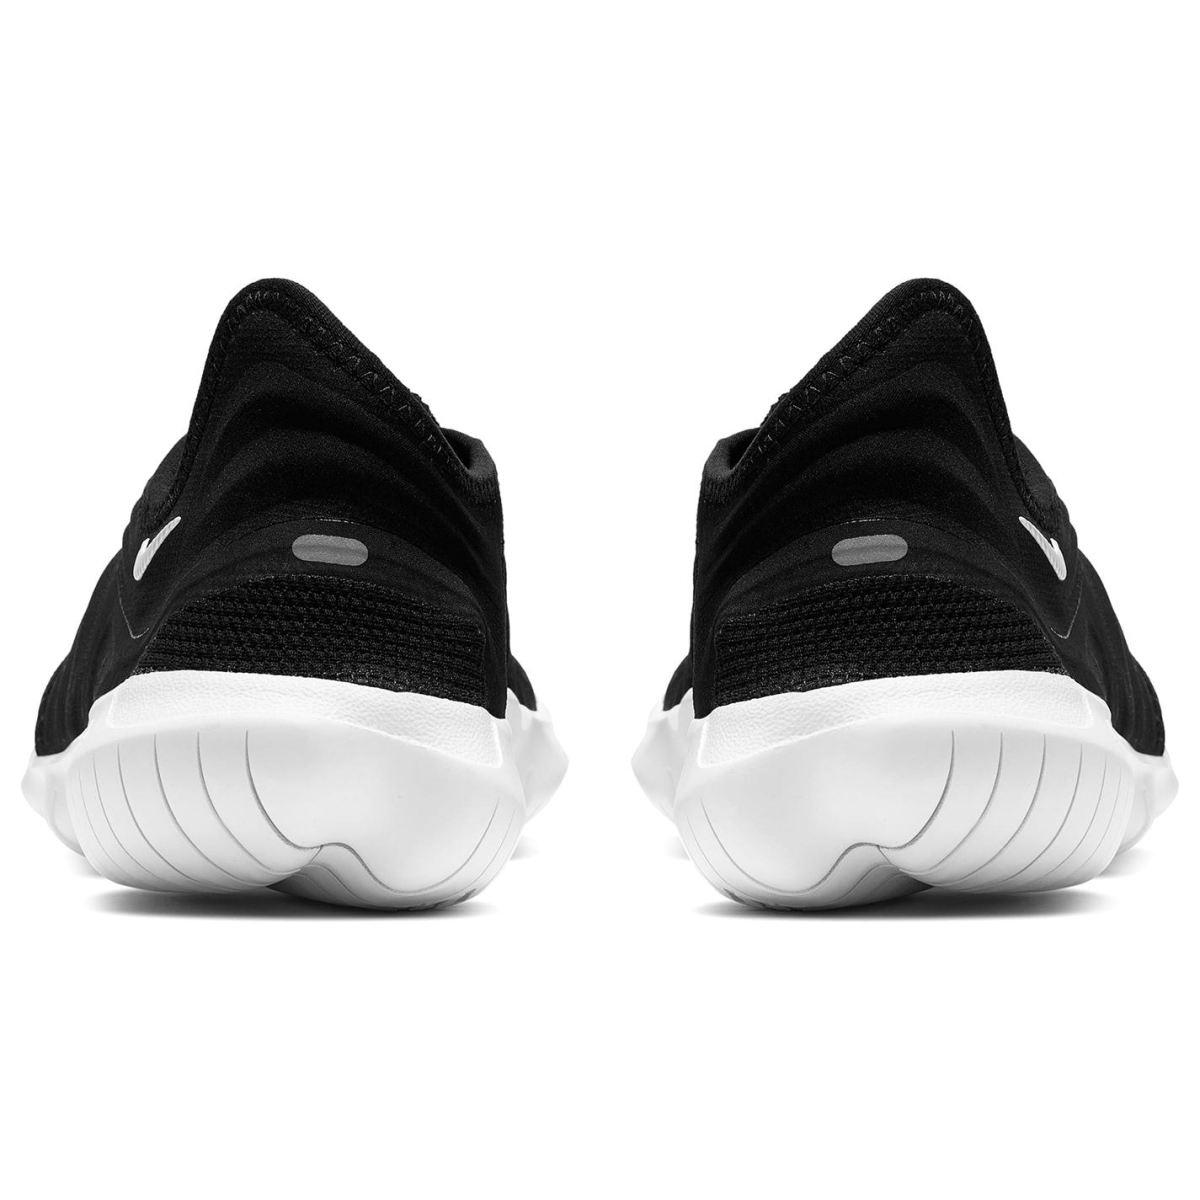 Nike-Free-Run-Flyknit-3-0-Turnschuhe-Damen-Sneaker-Sportschuhe-Laufschuhe-4450 Indexbild 5